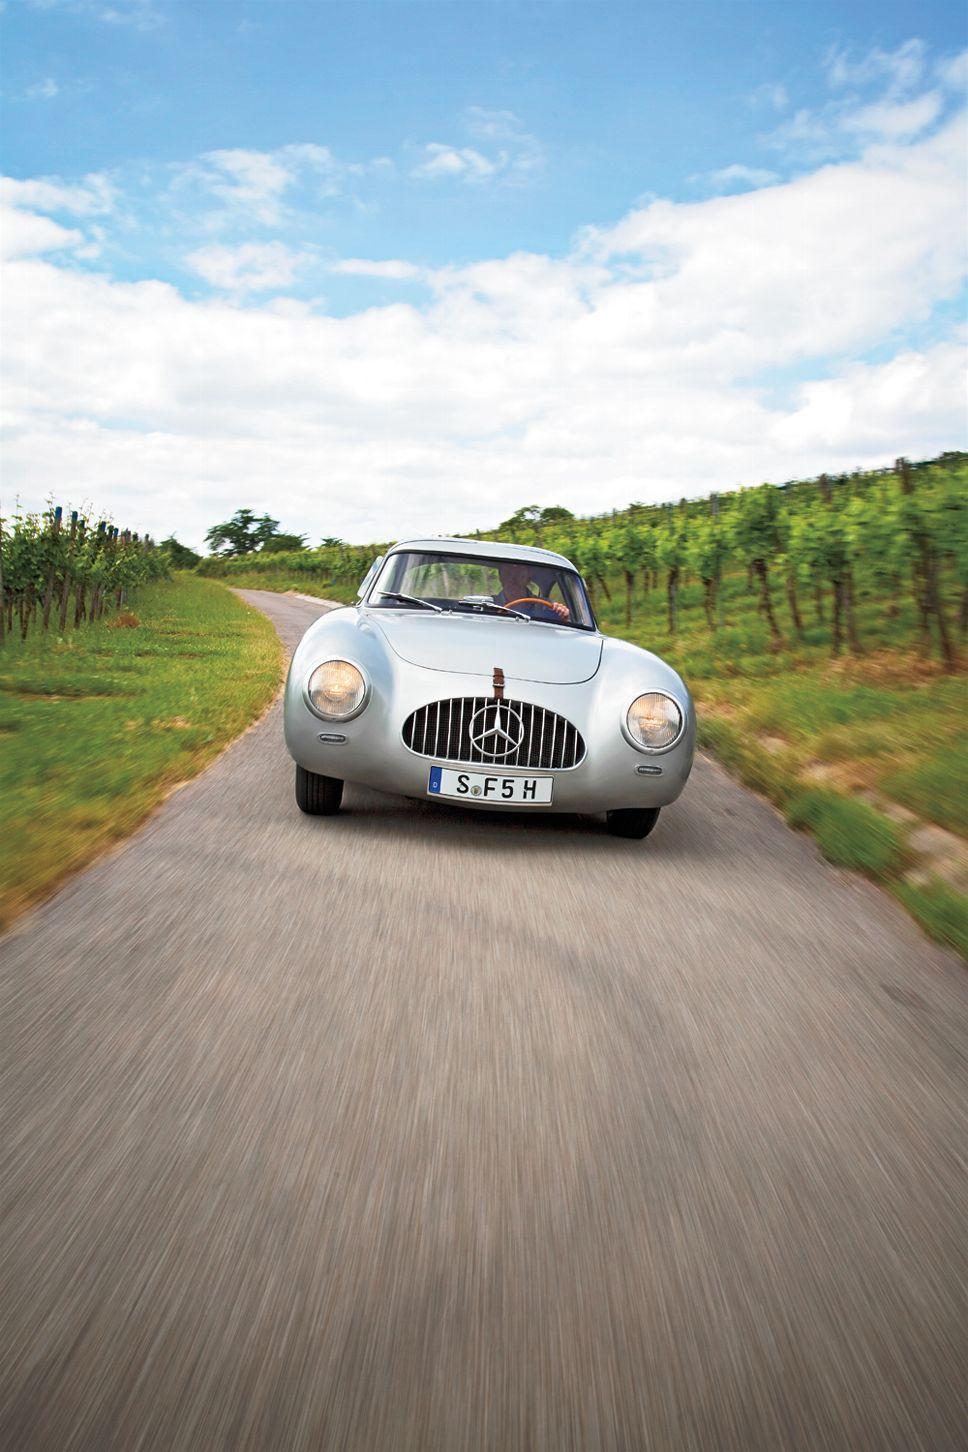 1952 Mercedes-Benz 300SL W194 00002 – Motor Trend Classic – Motor Trend